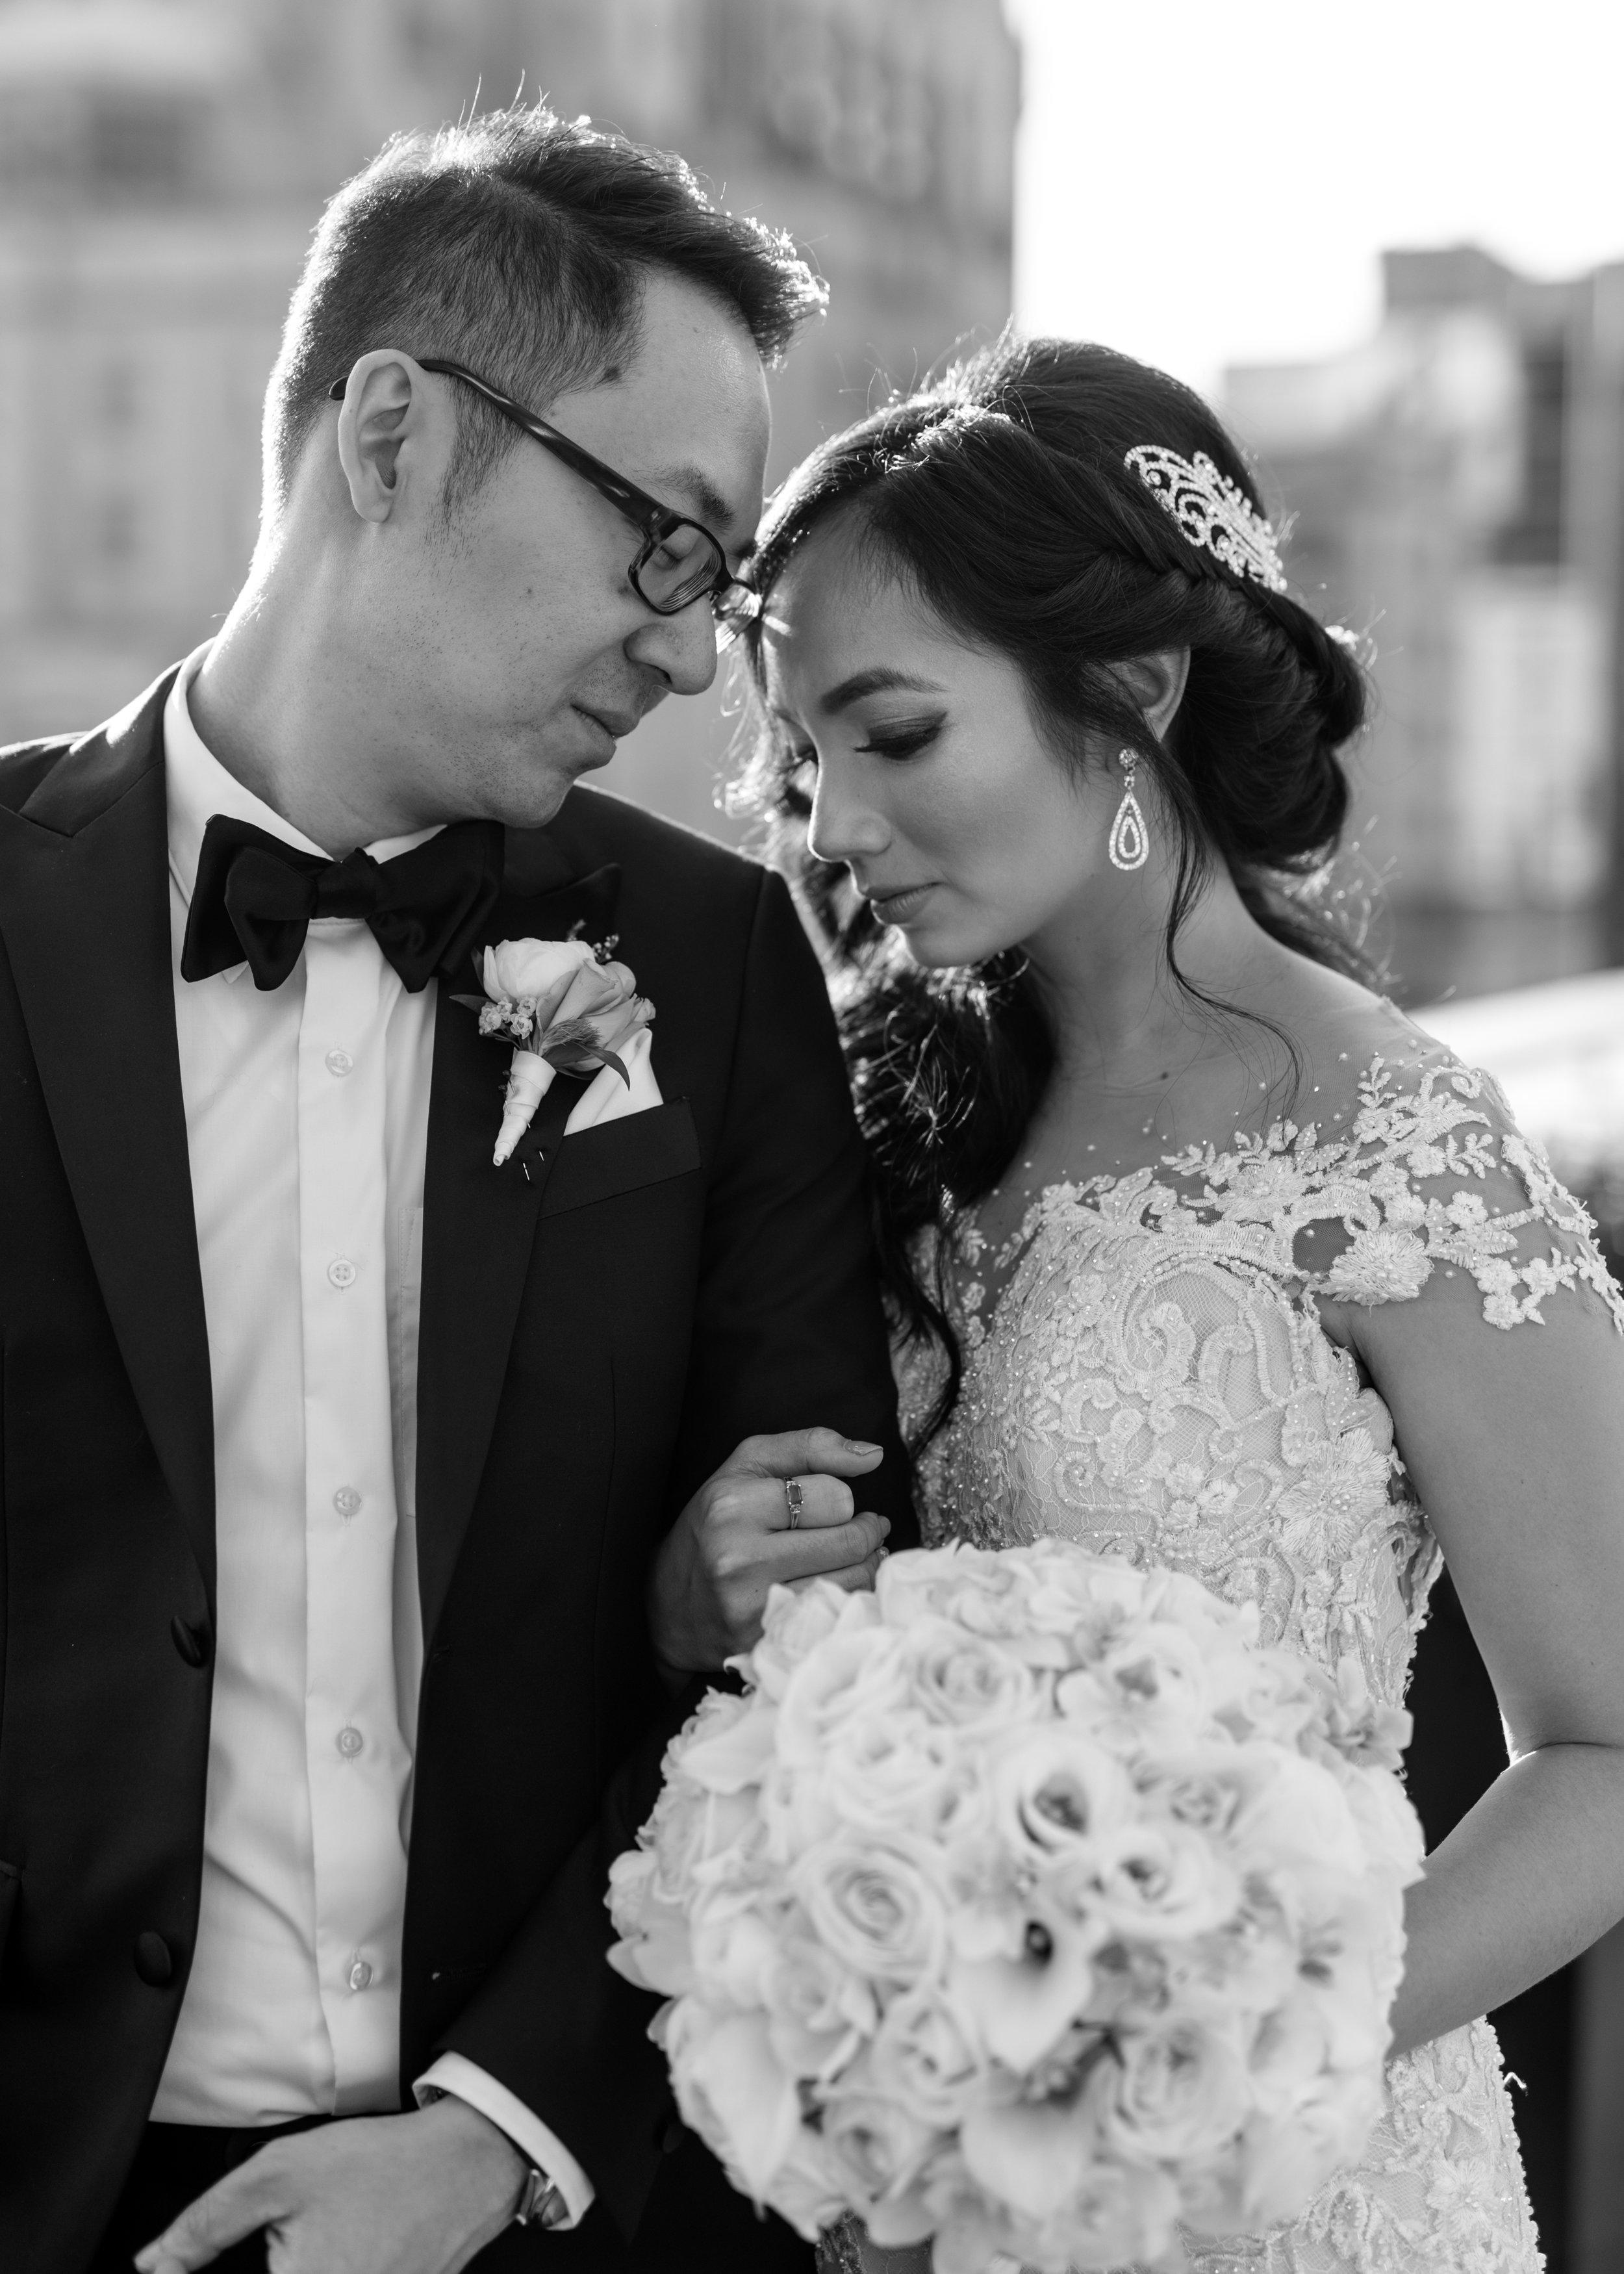 herastudios_wedding_chandy_dale_hera_selects-60.jpg